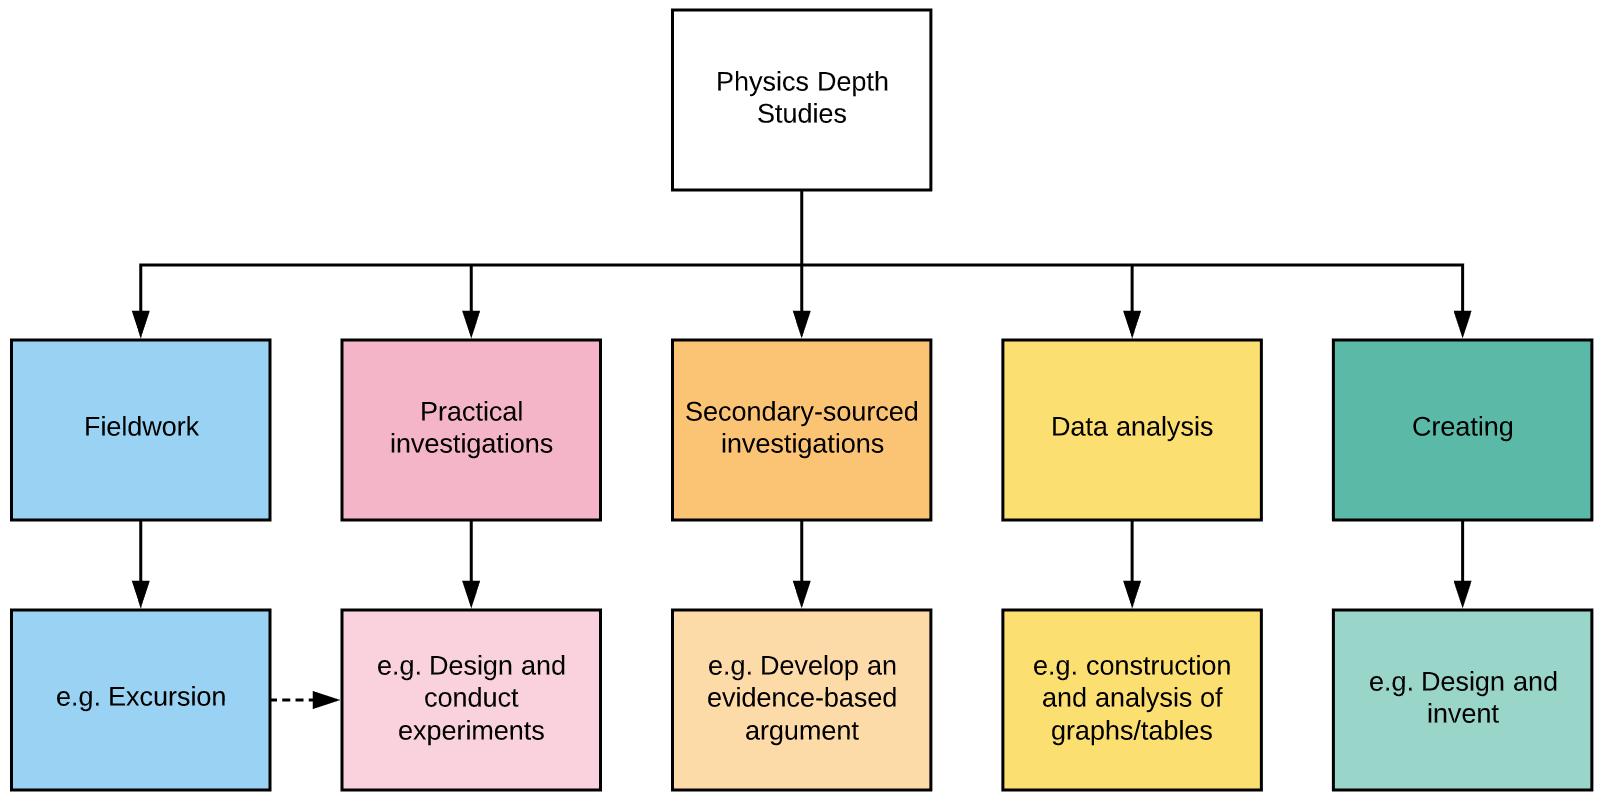 Physics Depth Studies Category Flowchart